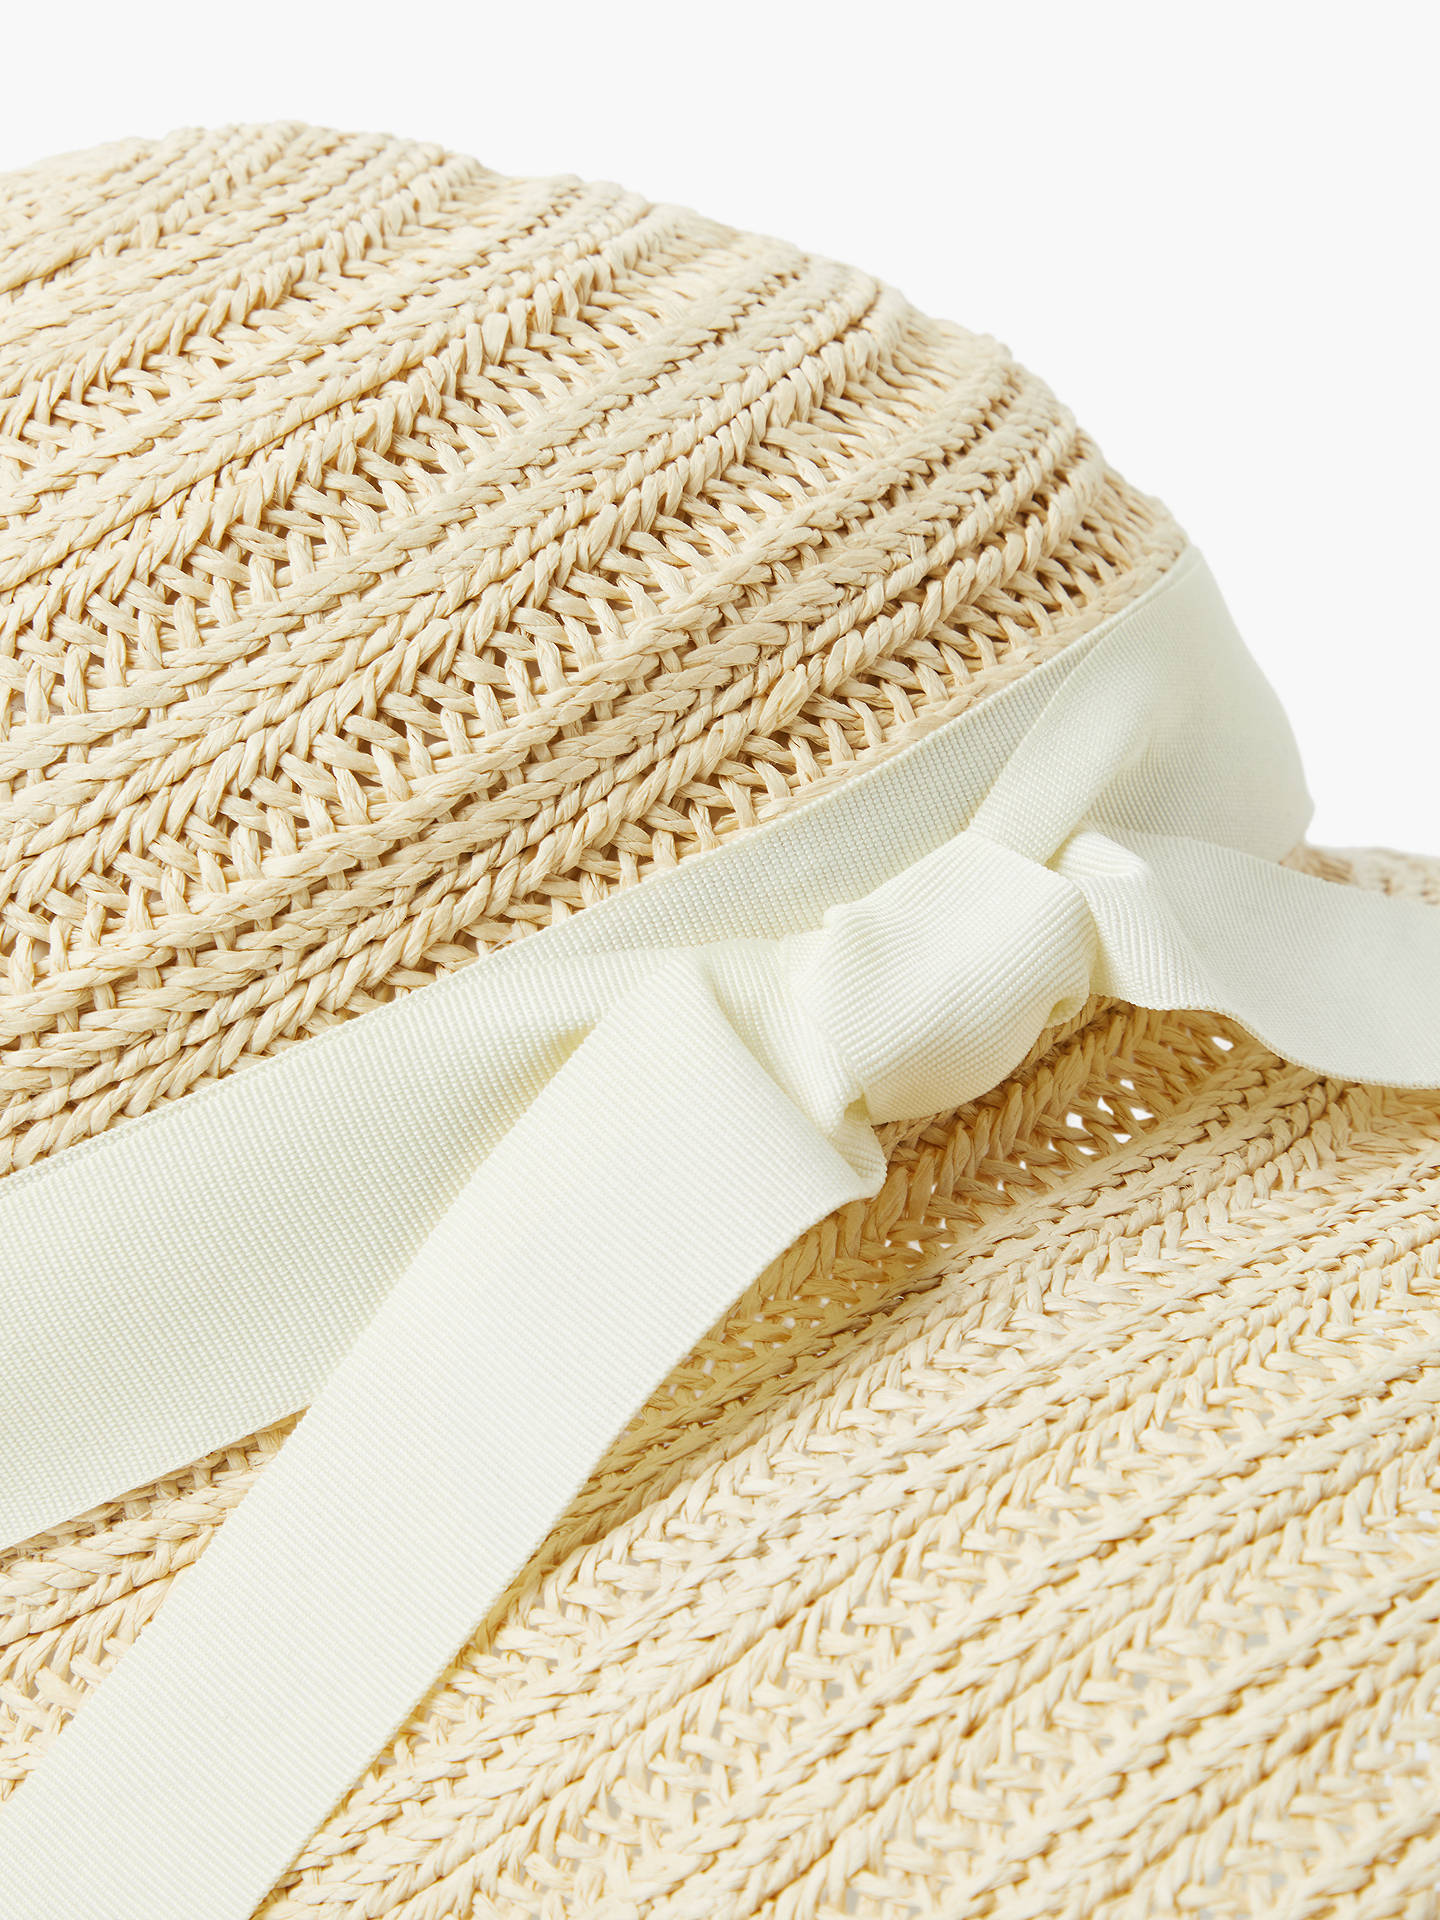 8655de43 Buy John Lewis & Partners Downturn Brim Garden Sun Hat, Natural Online at  johnlewis.